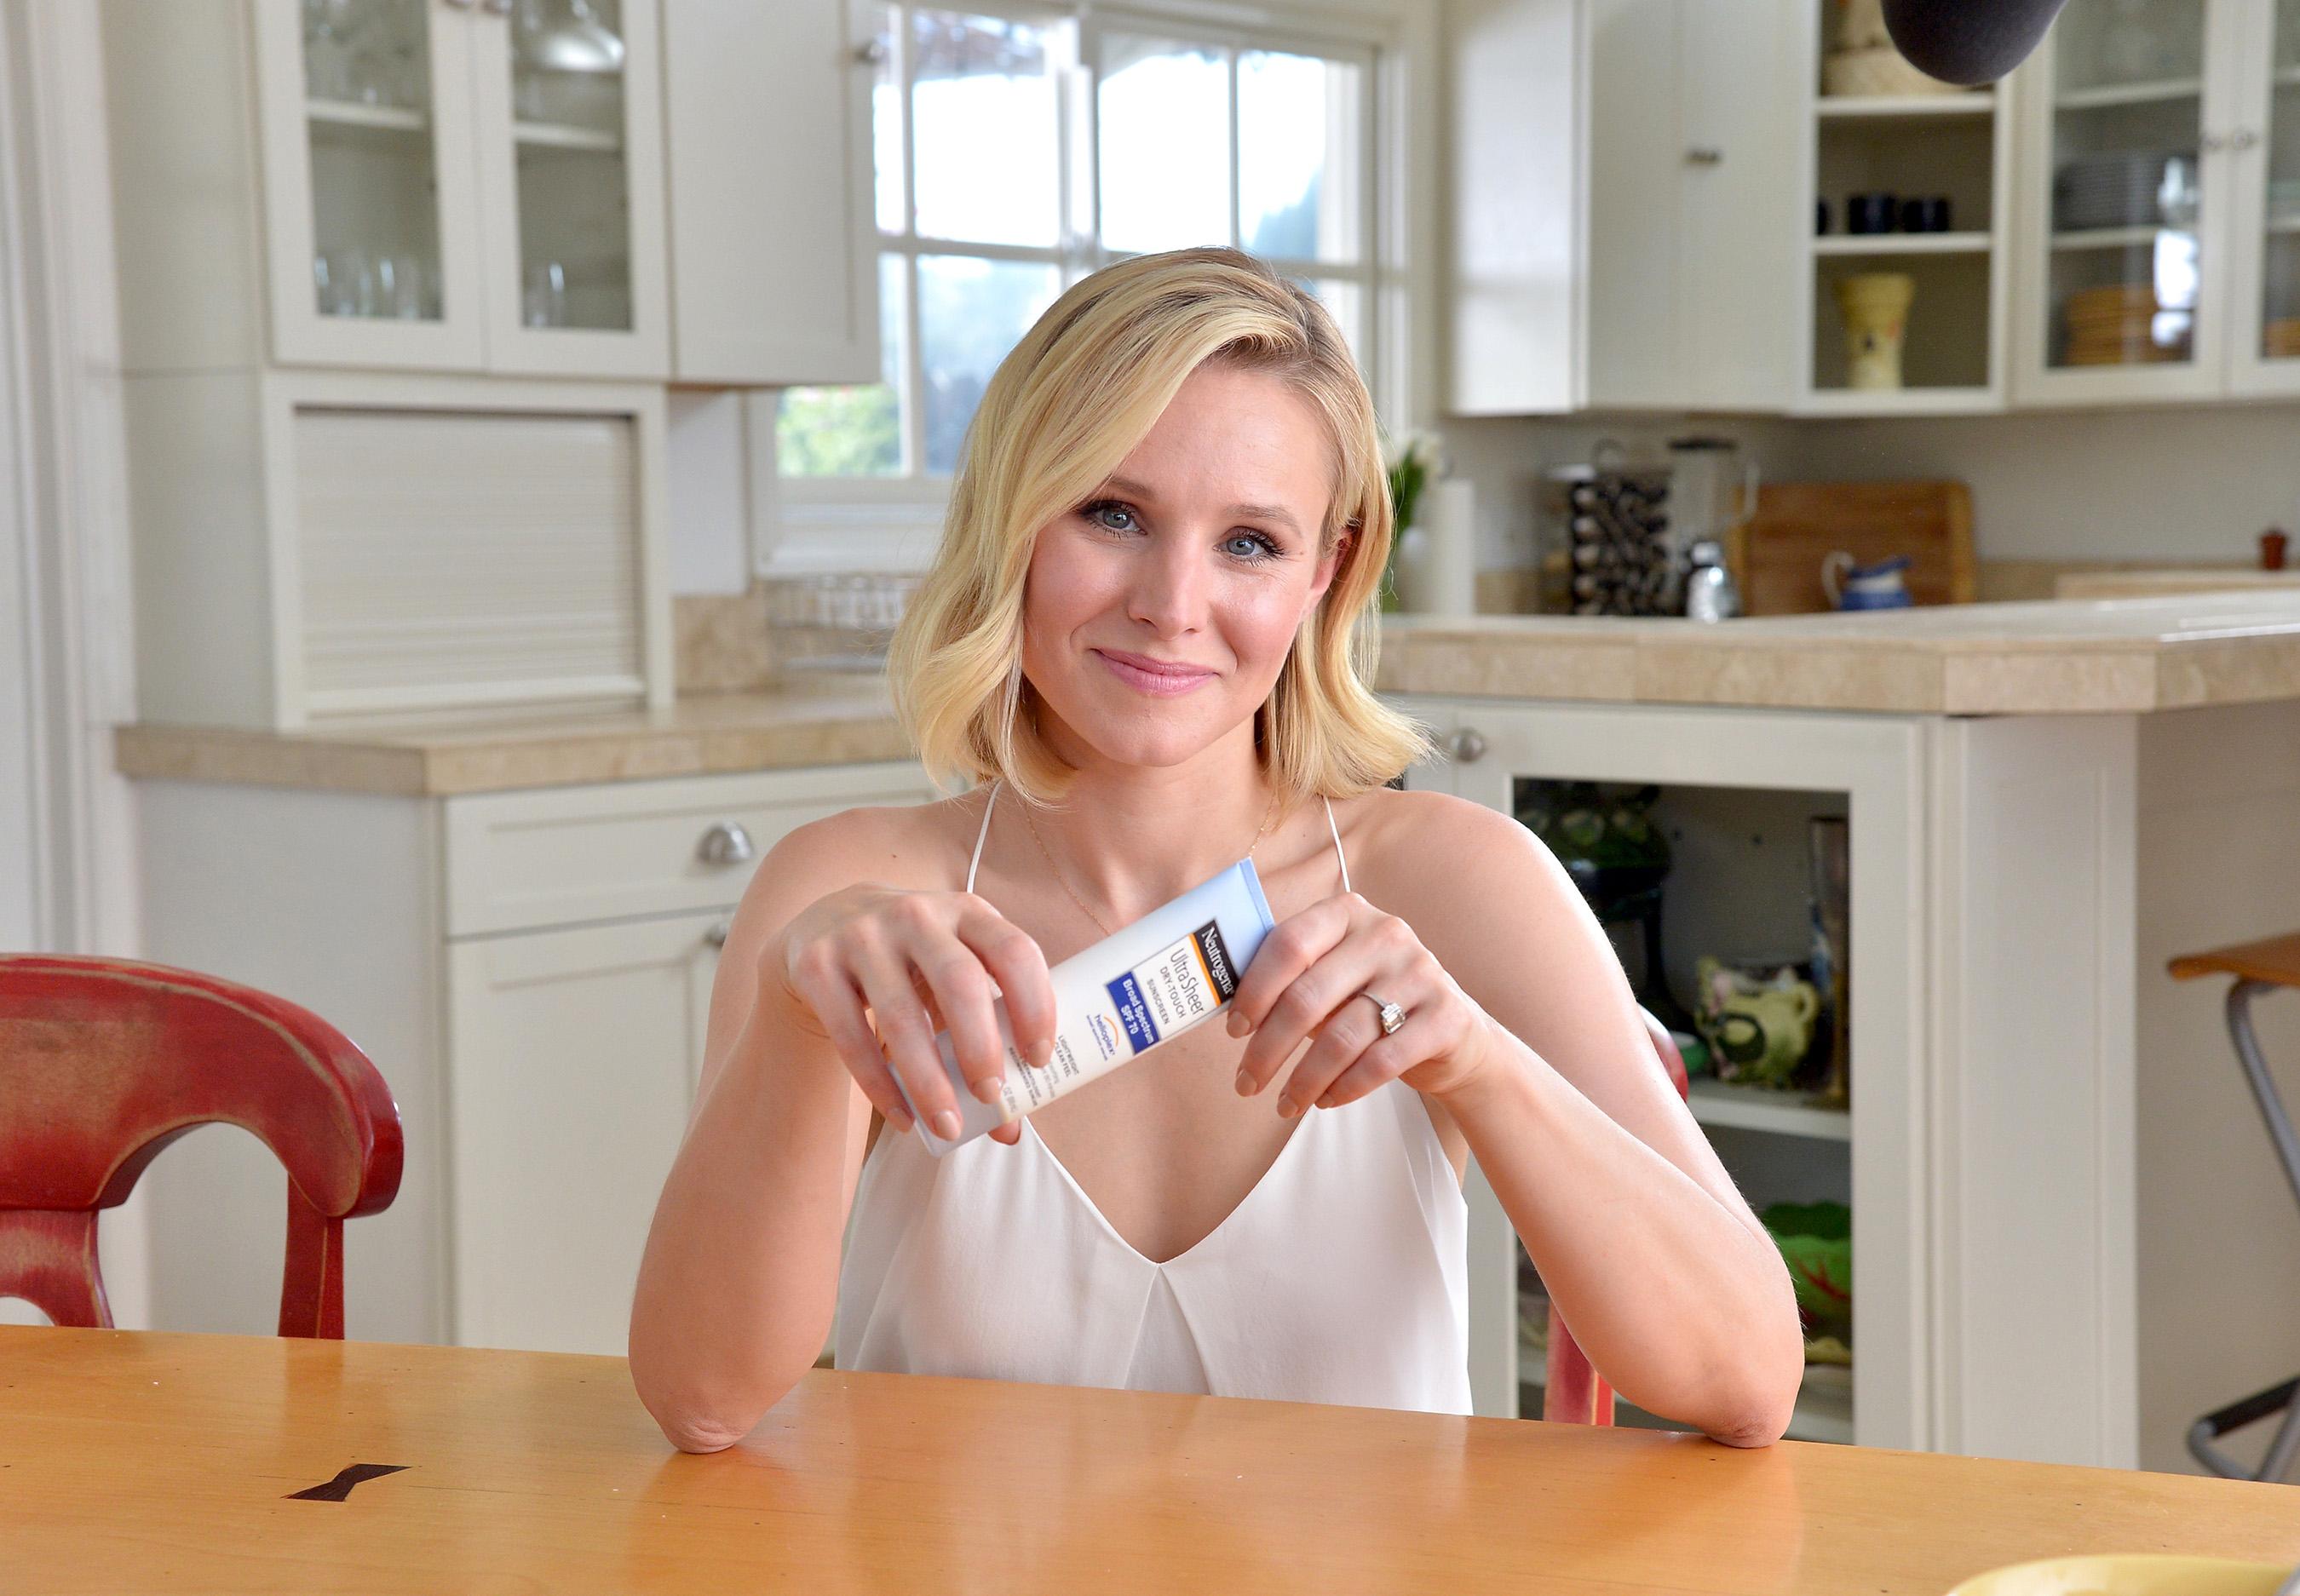 Neutrogena® Brand Ambassador, Kristen Bell